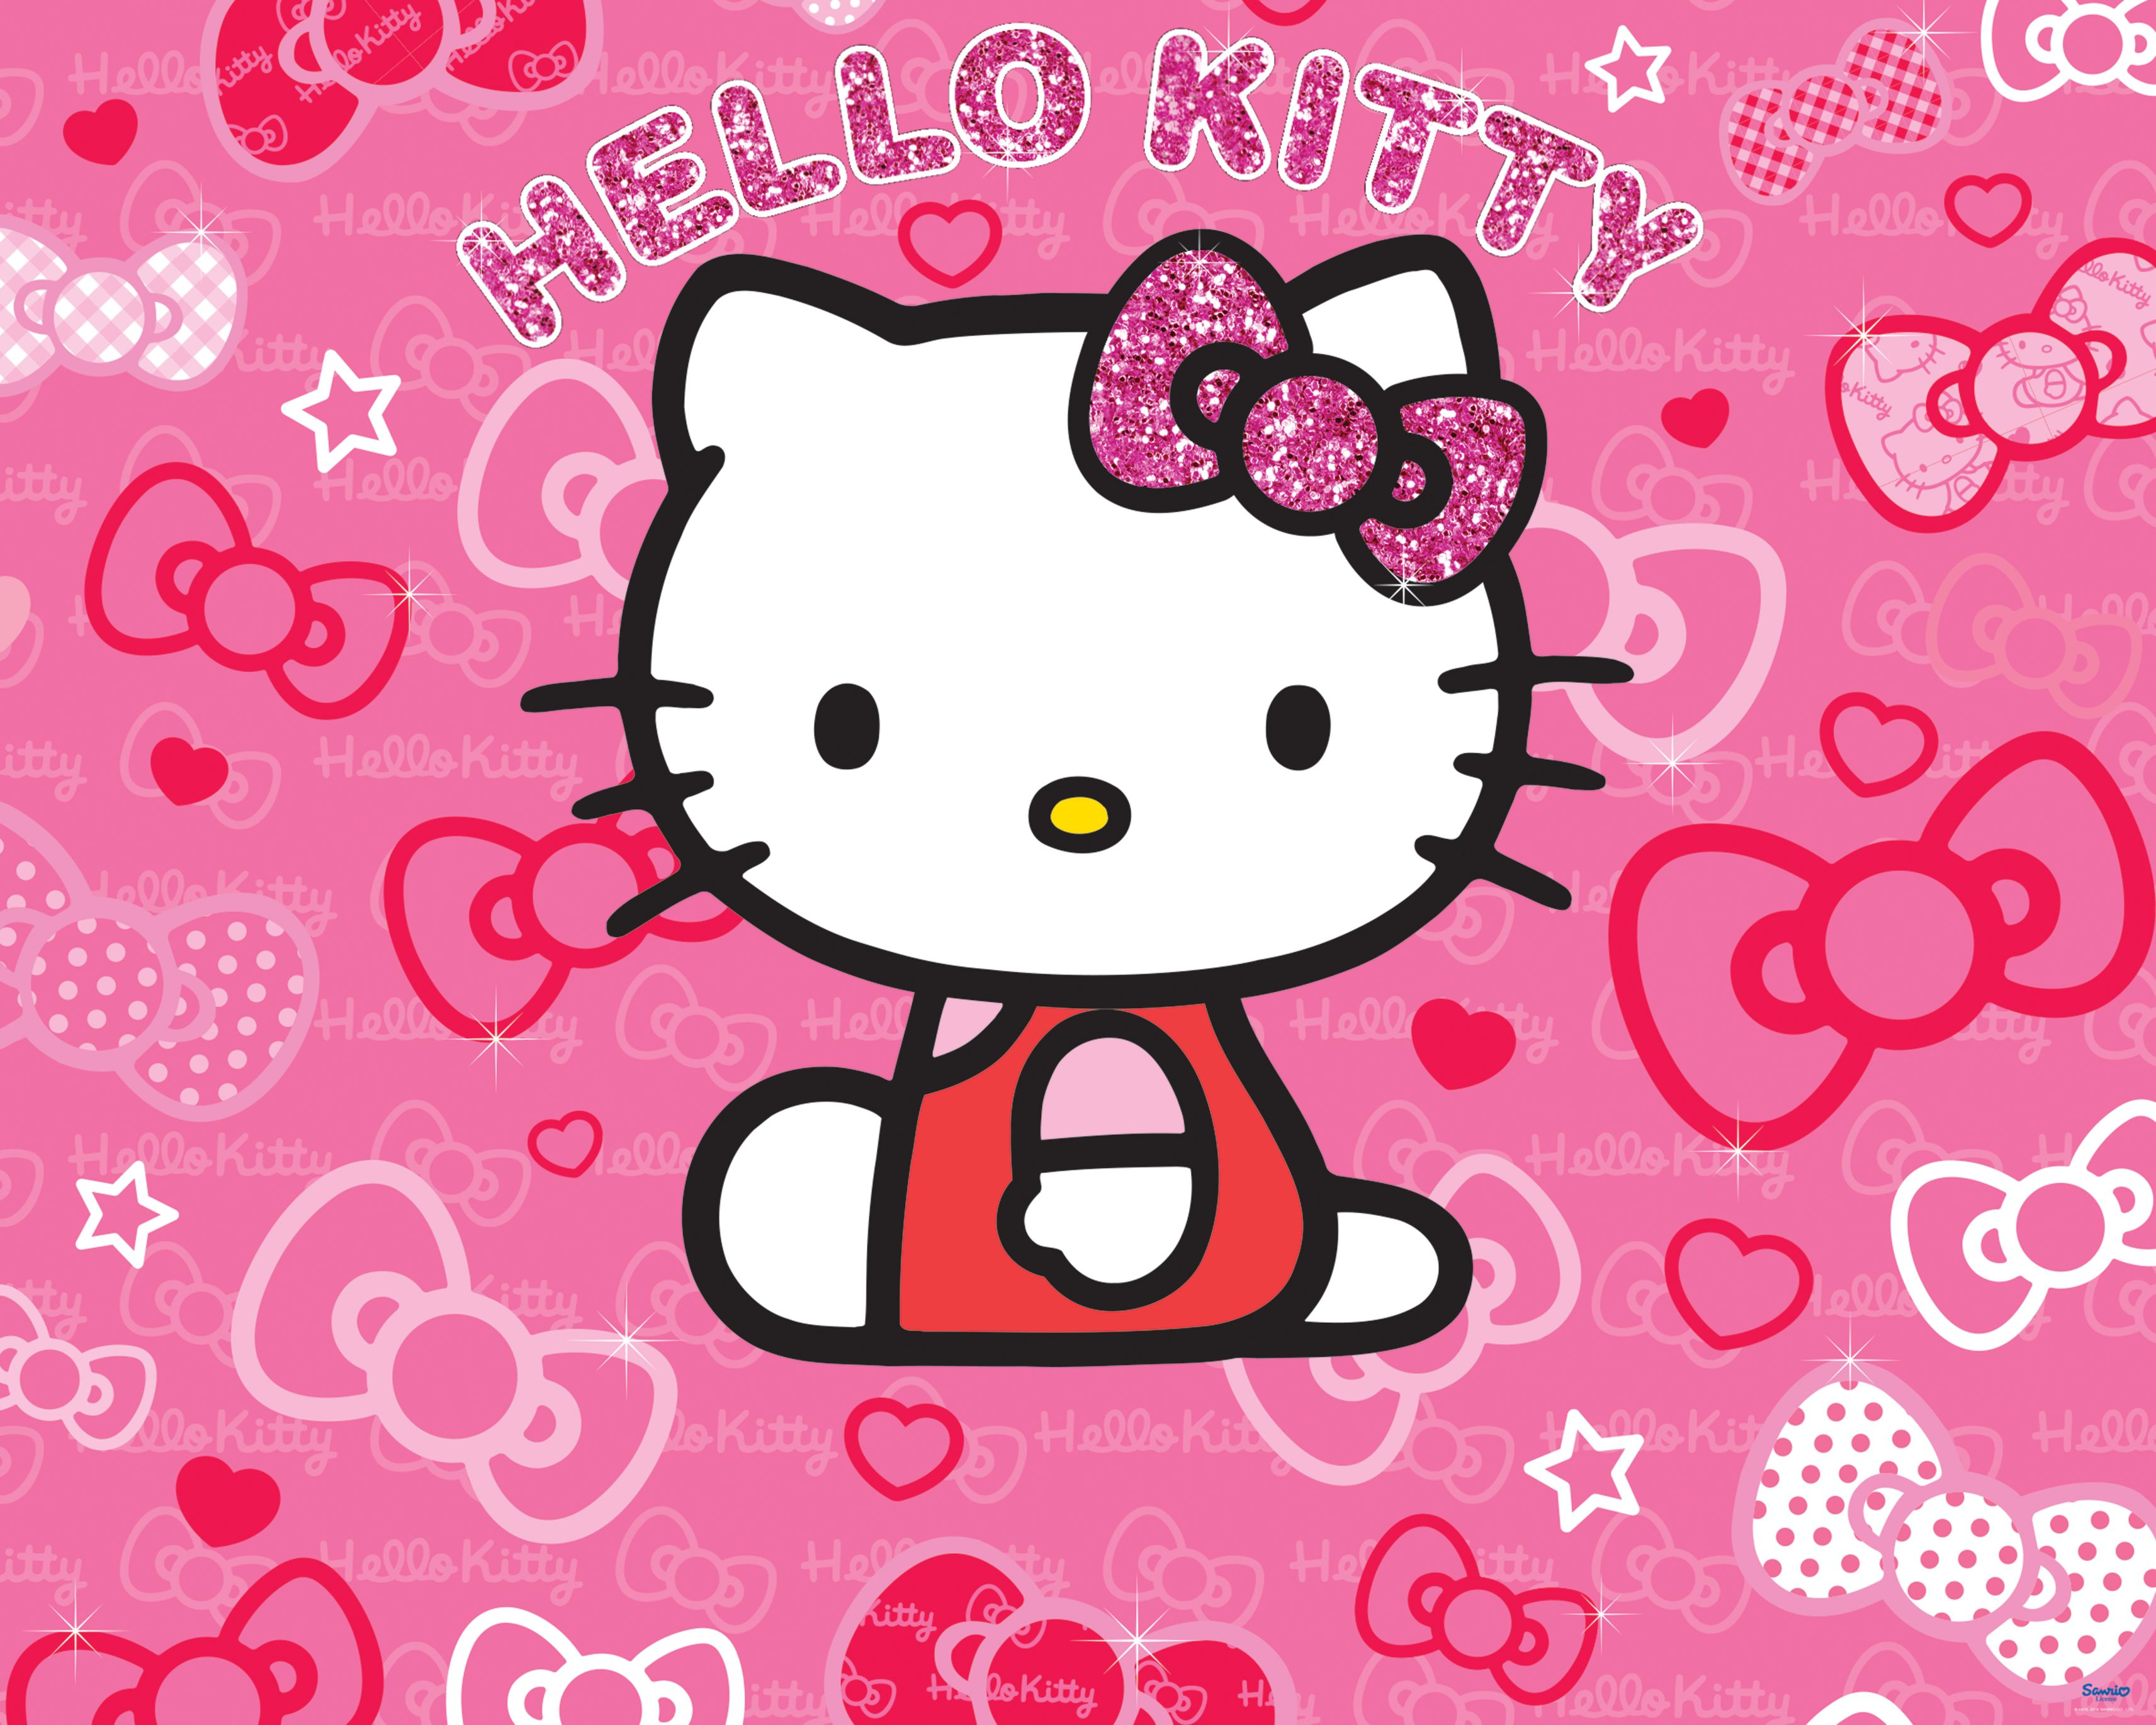 Hello kitty bedroom ireland - Hello Kitty Bedroom Ireland 23